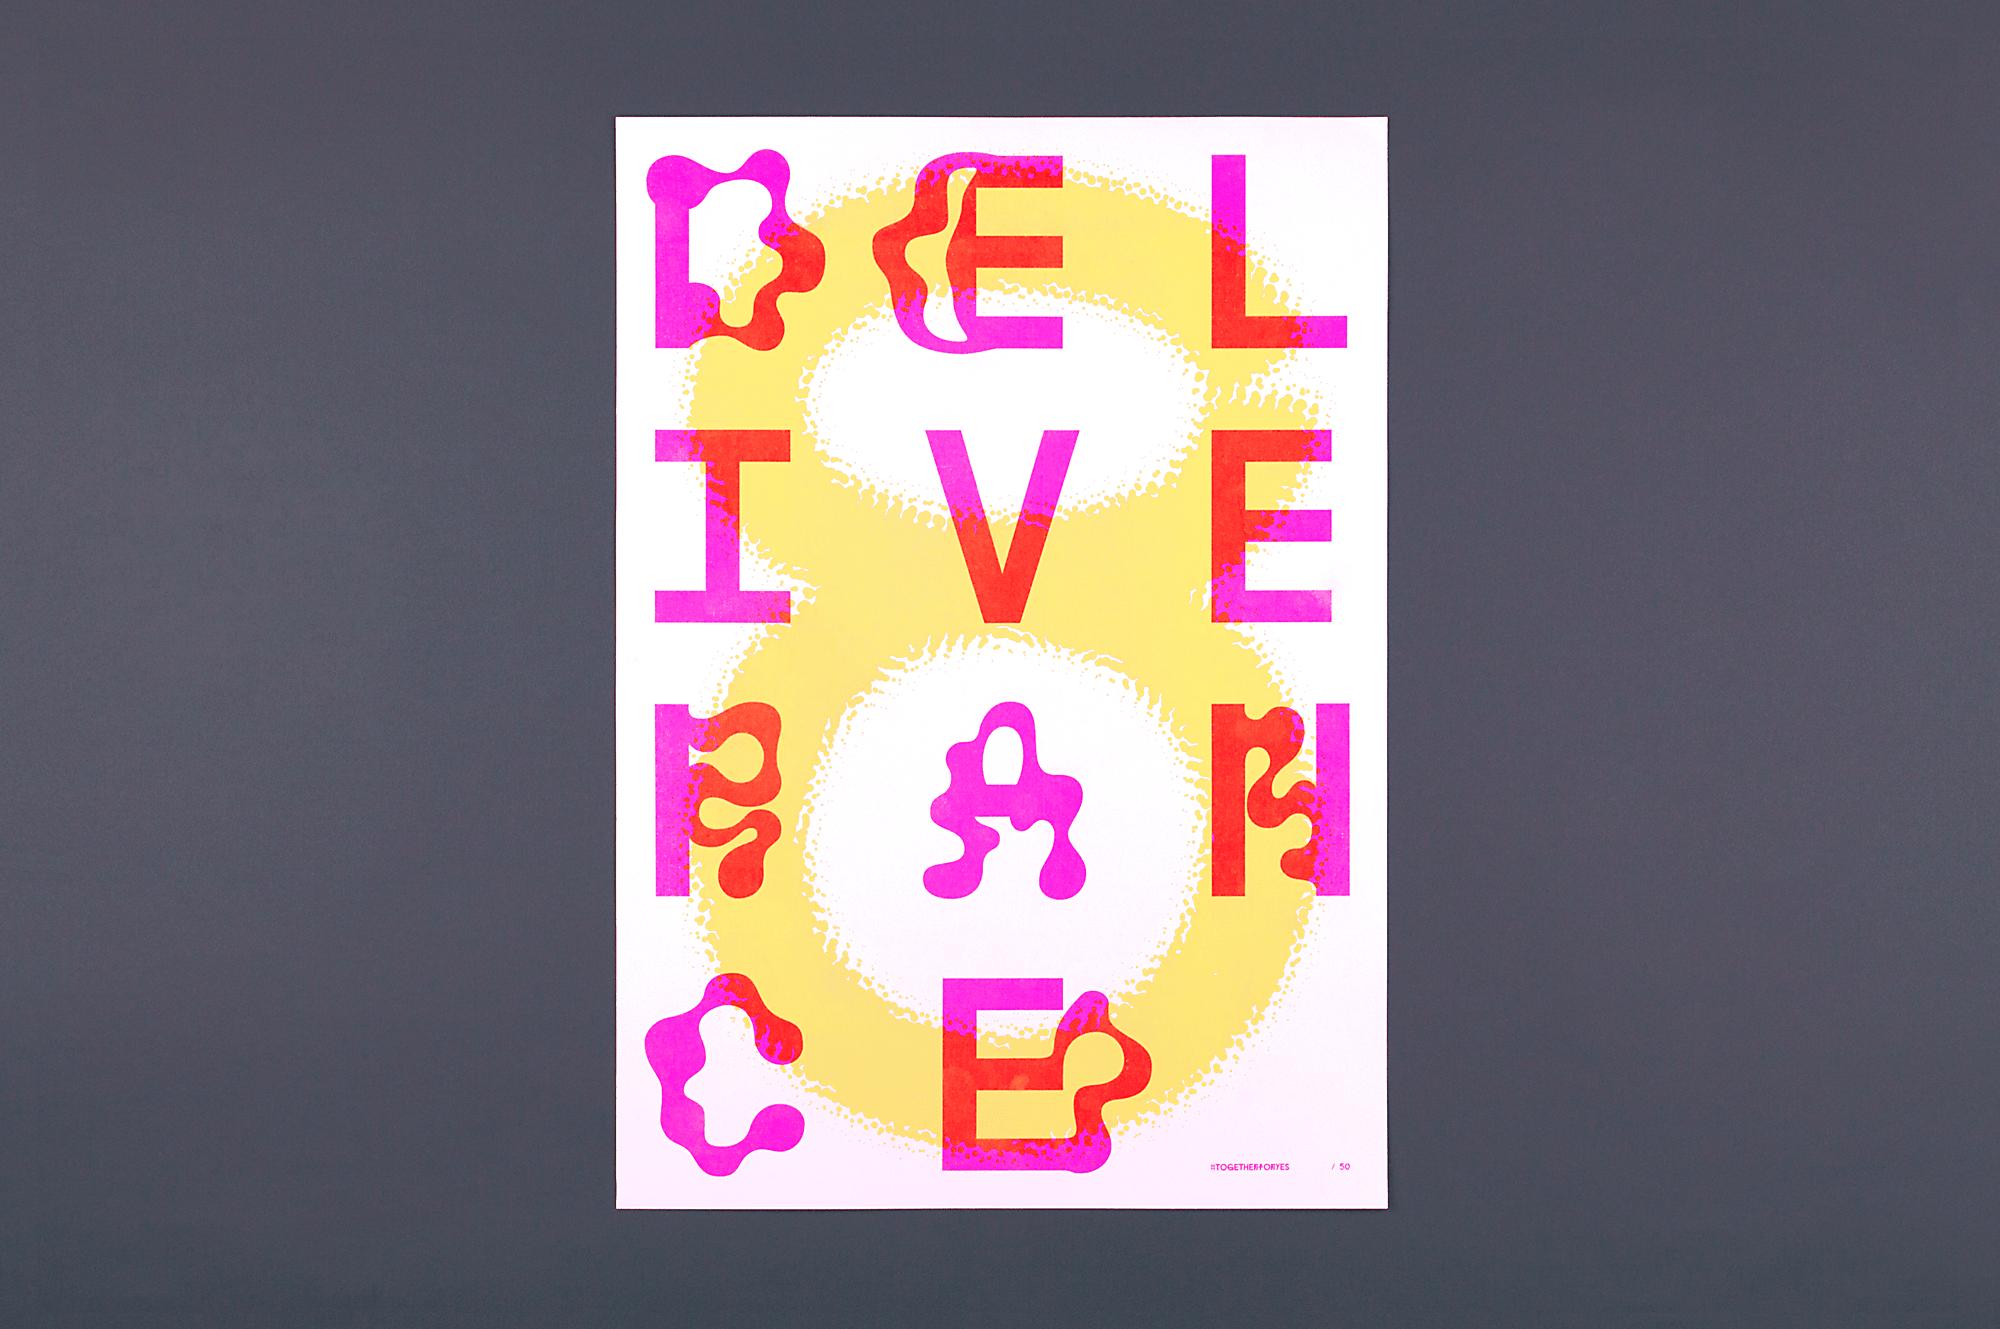 Cover image: Deliverance